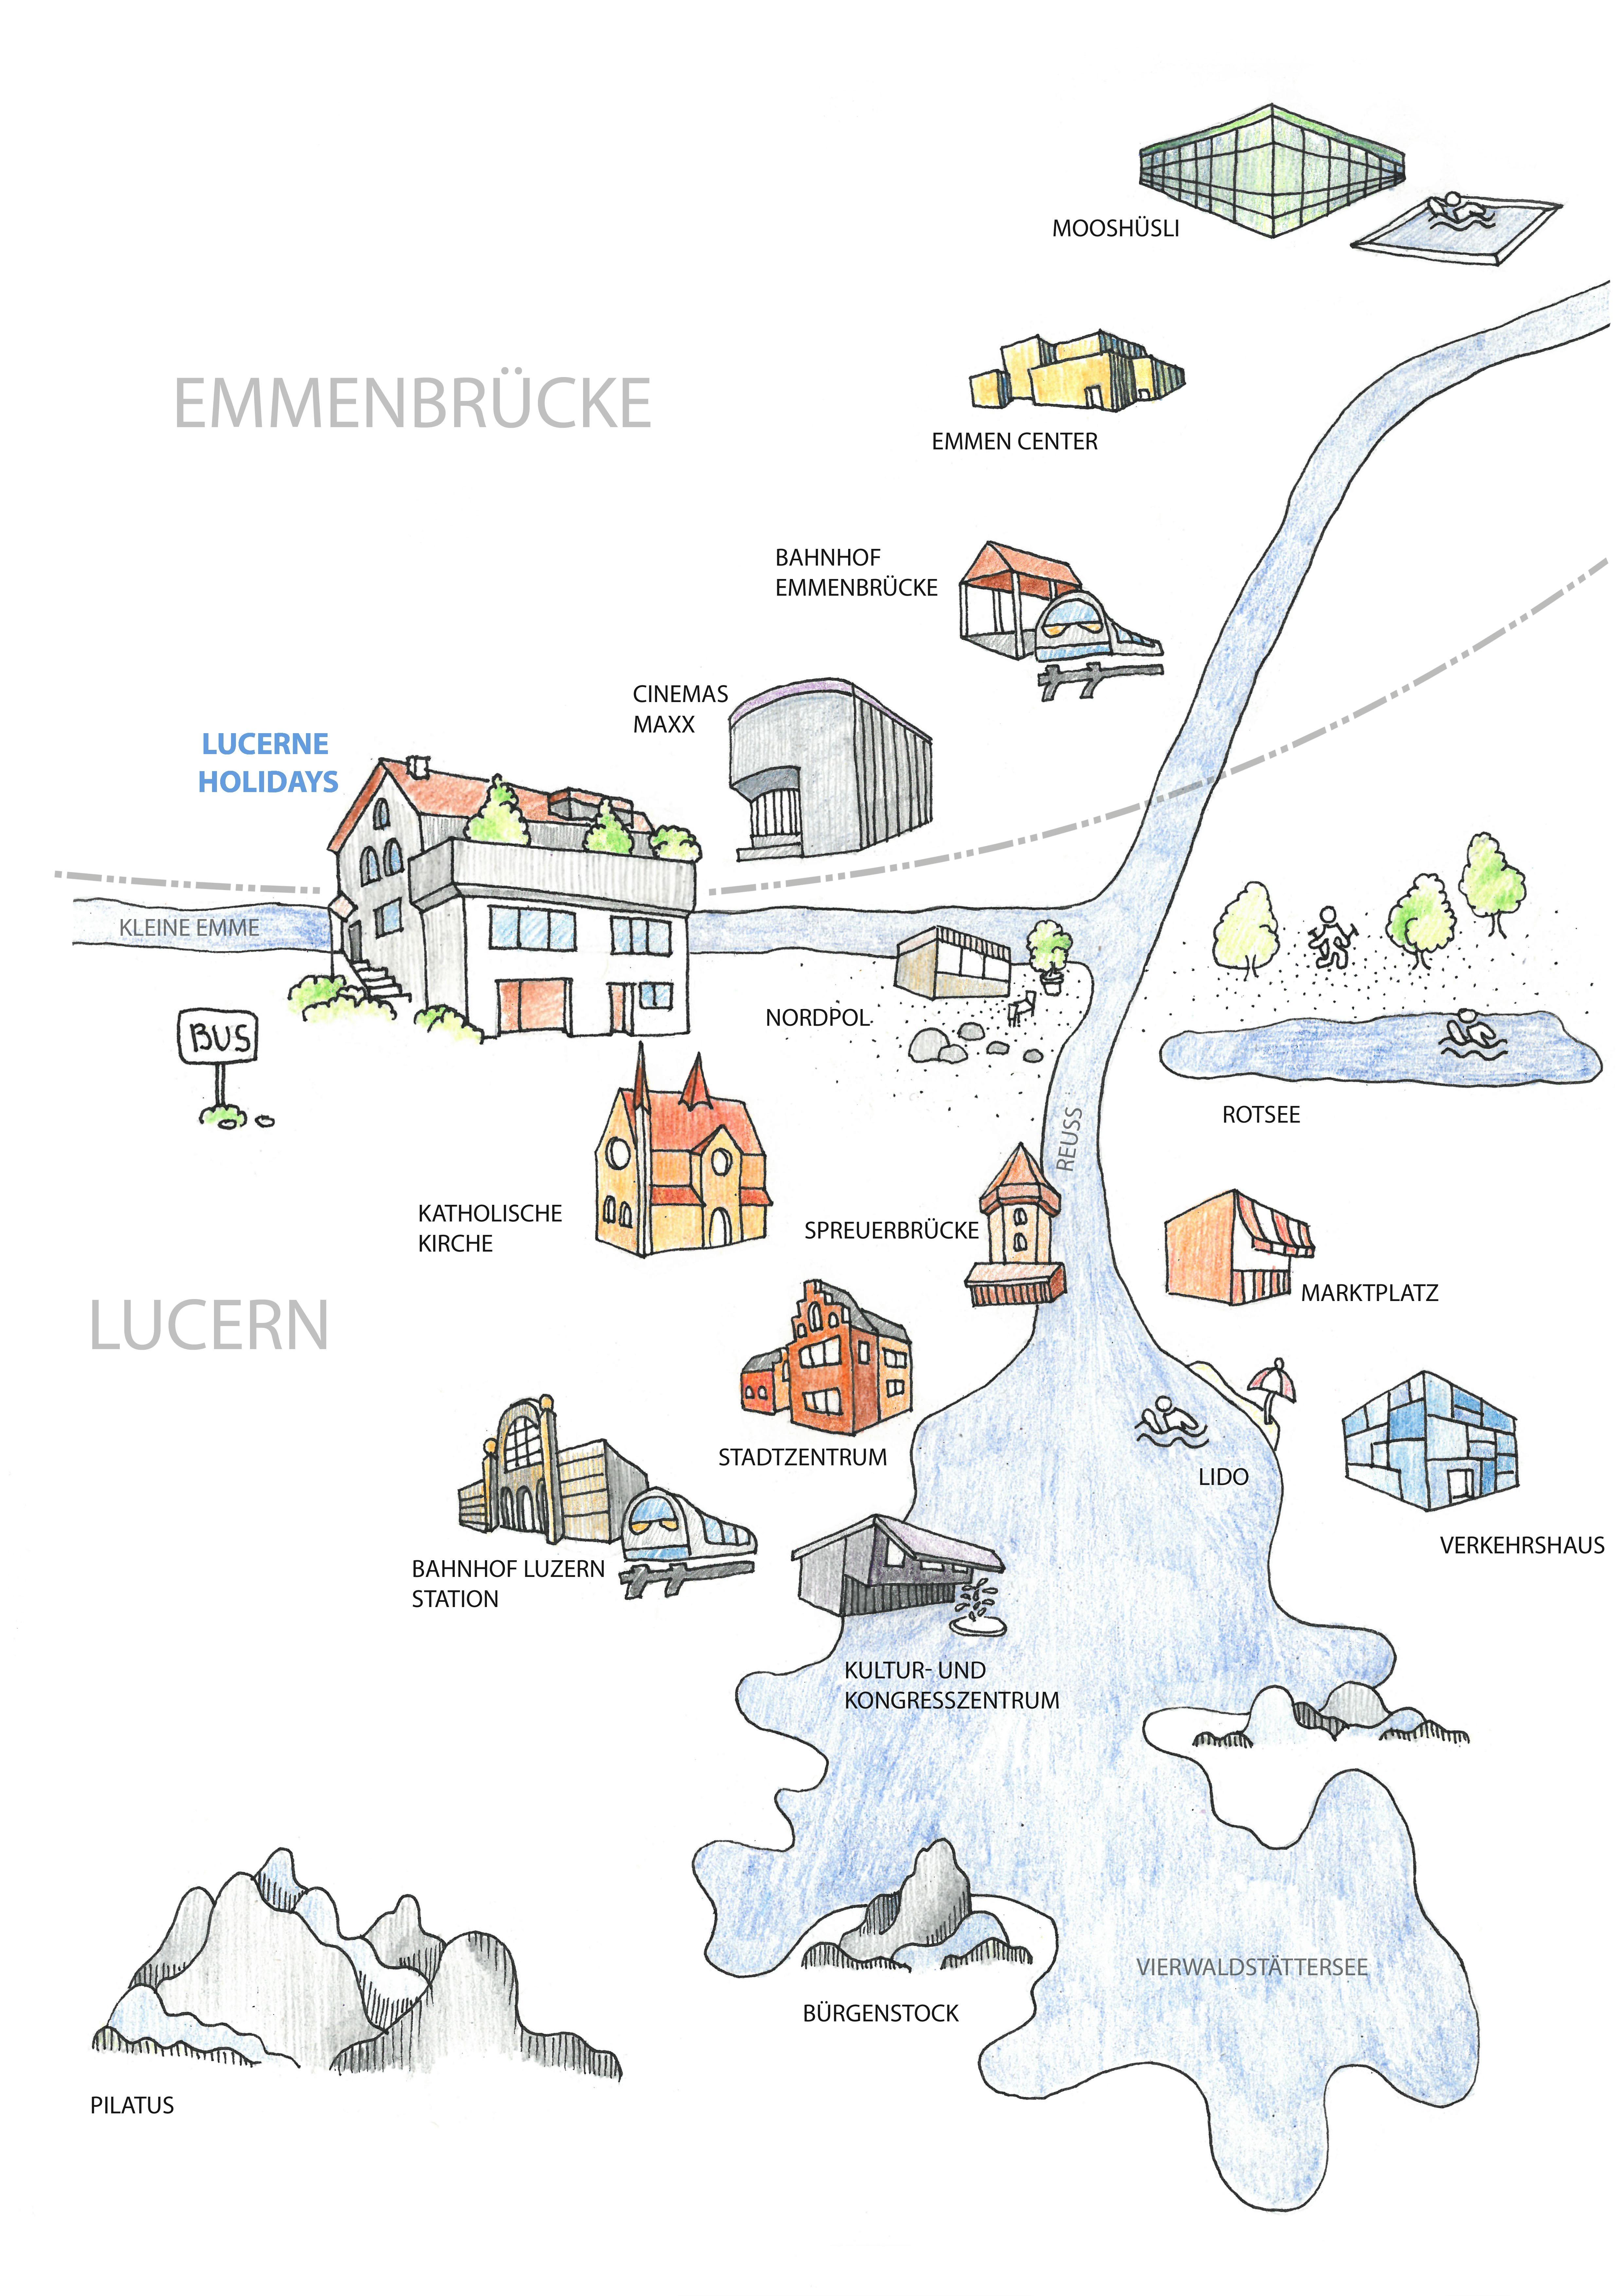 Lucerne Holidays GmbH